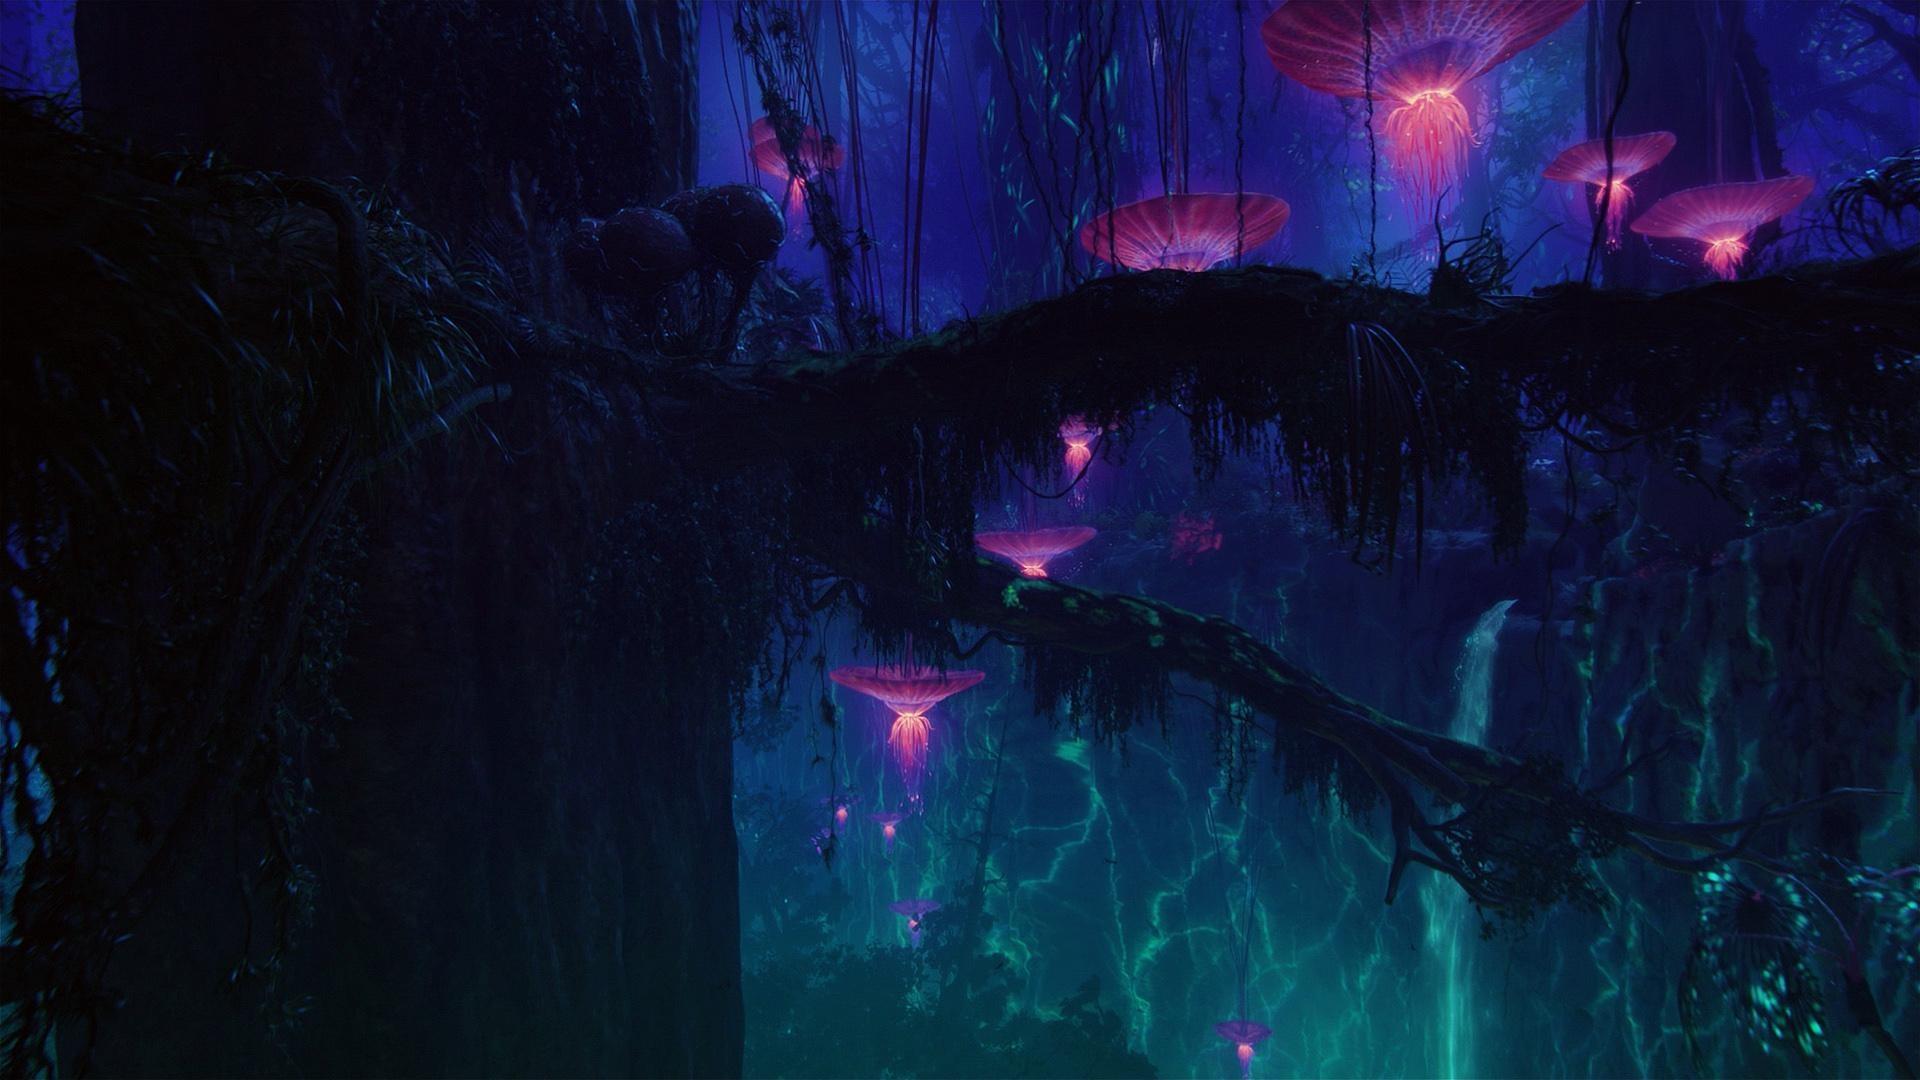 avatar   Something magical….movie stills   Pinterest   Avatar, Creature  concept and Fantasy landscape